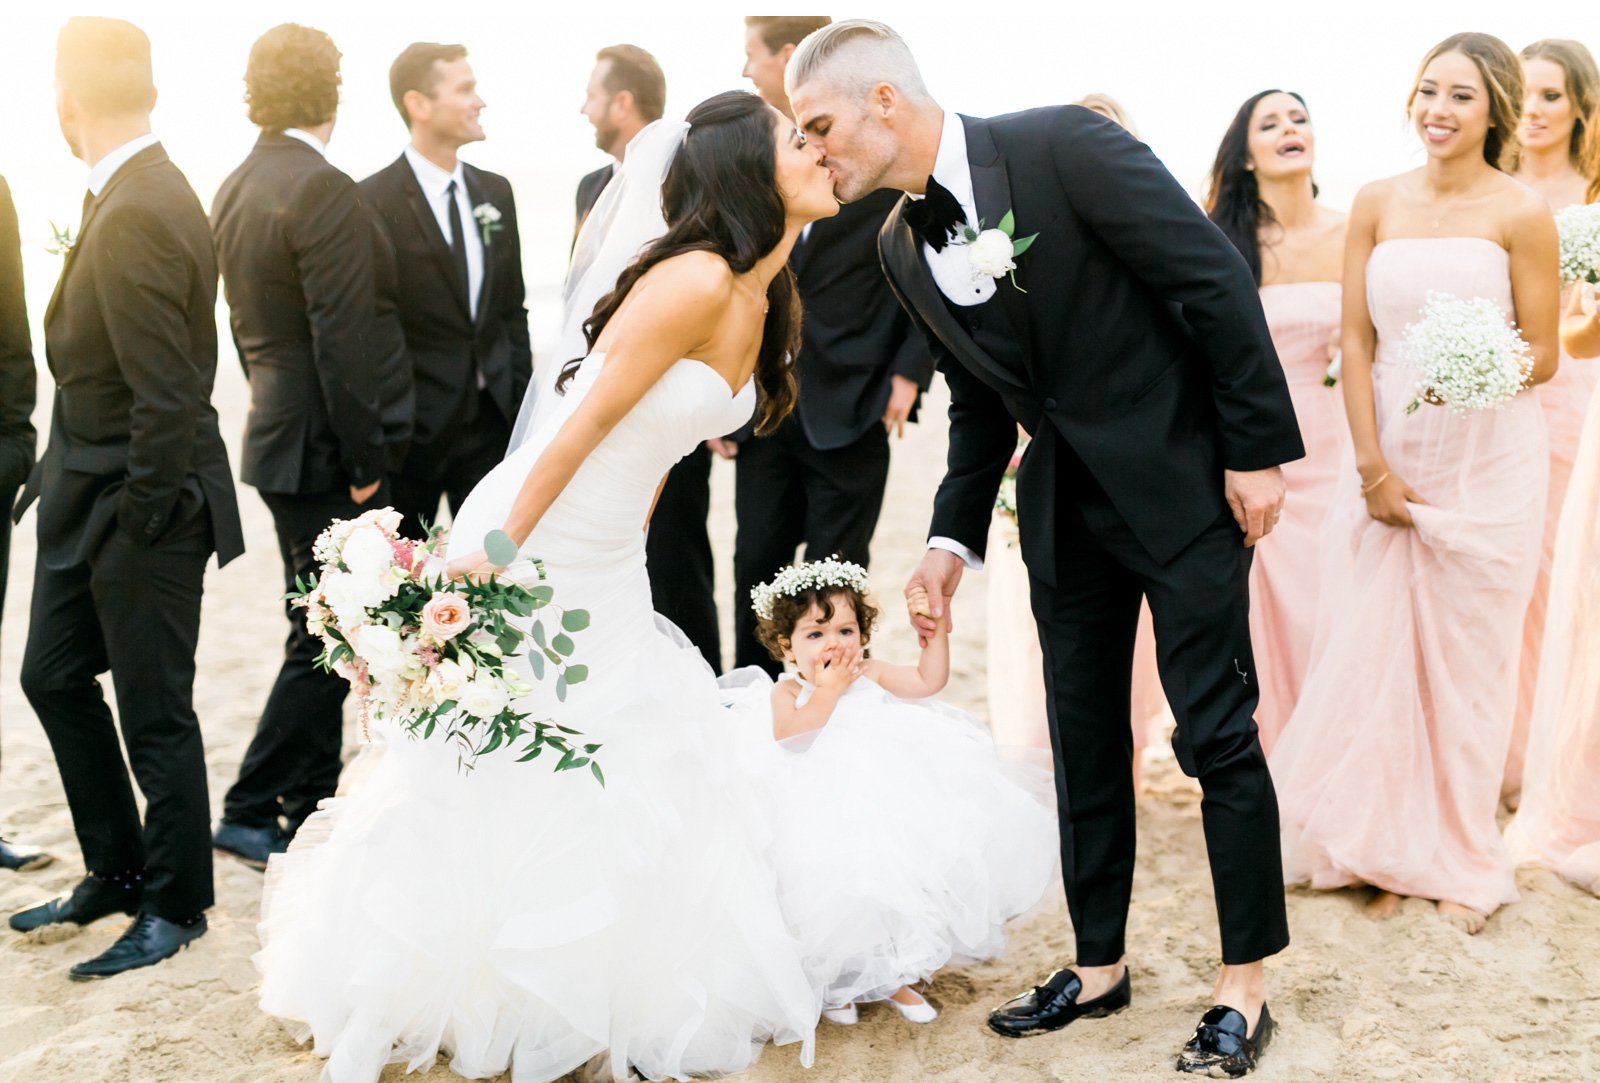 Style-Me-Pretty-Malibu-Beach-CA-Wedding-Natalie-Schutt-Photography_02.jpg